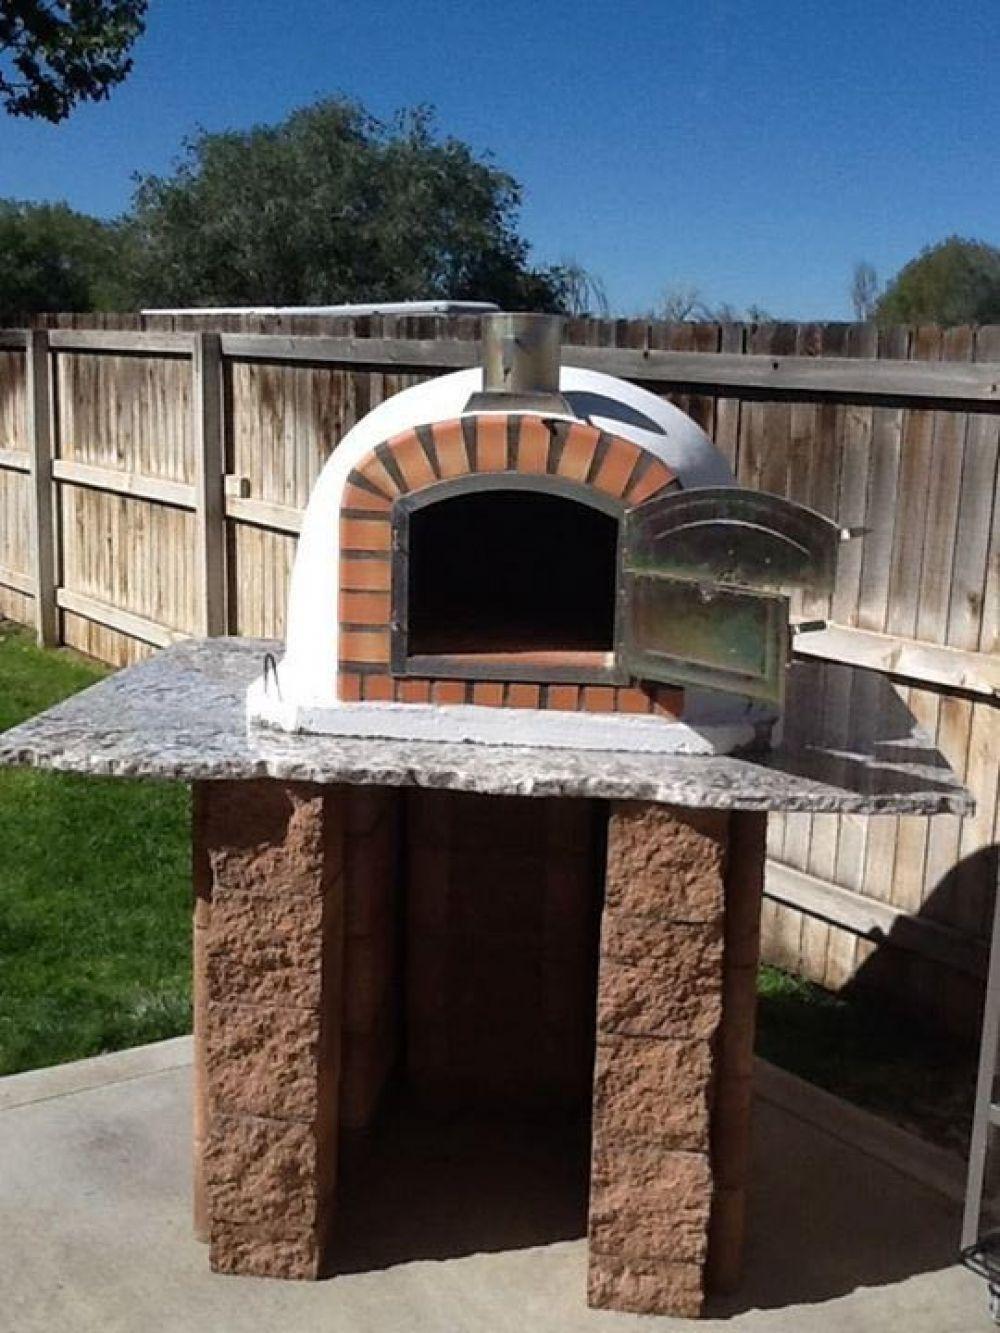 25 Best Diy Backyard Brick Barbecue Ideas Pizza Oven Outdoor Outdoor Pizza